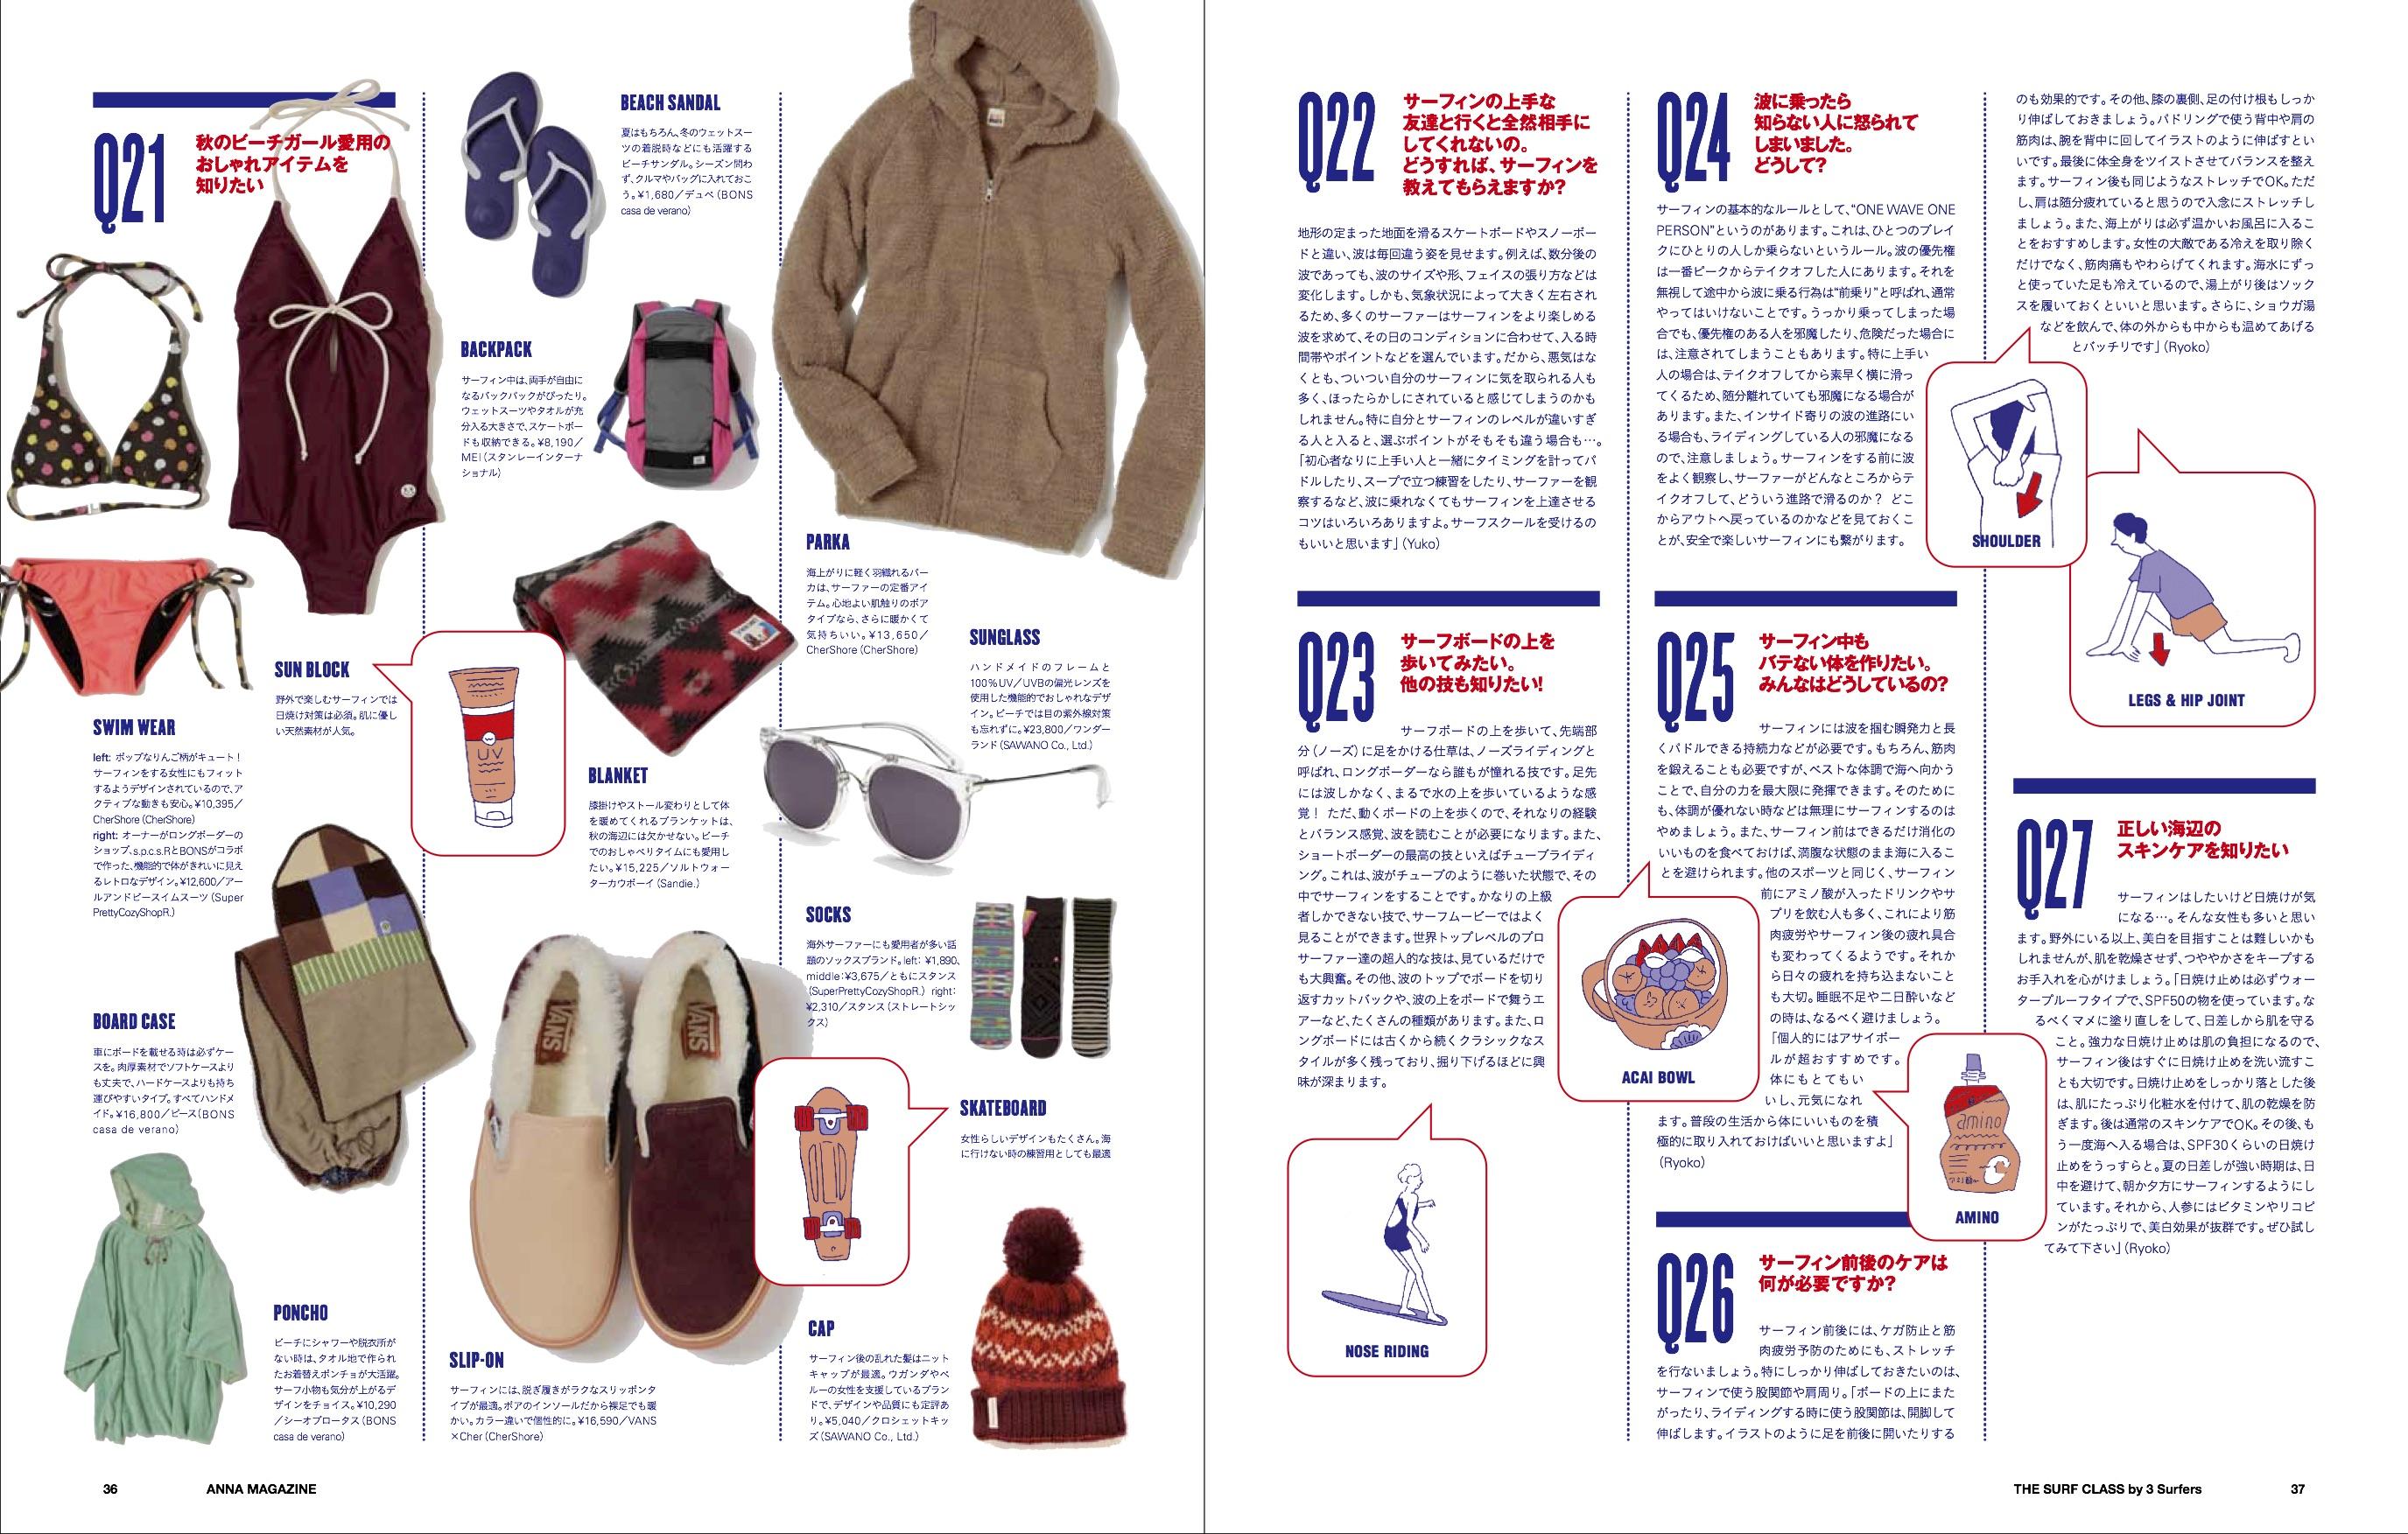 anna magazine Vol.1 P19